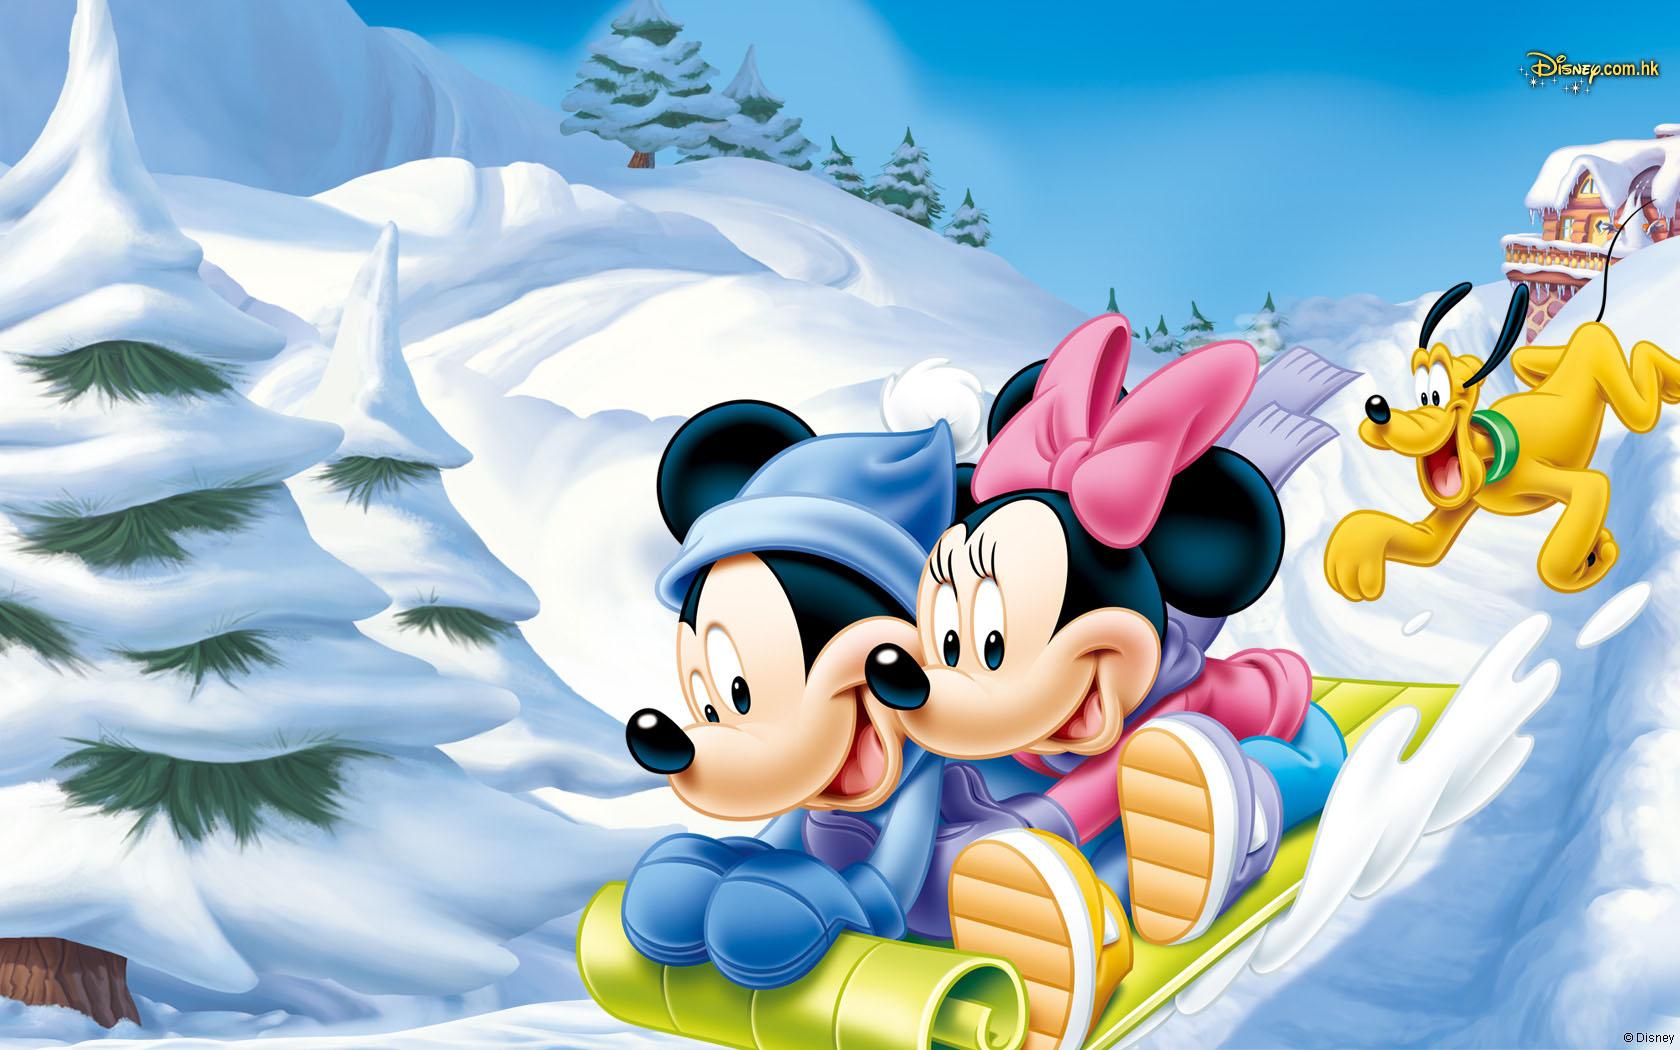 обои Микки Маус / Micky Mouse и Мини / Minie мчатся с горки на санках...